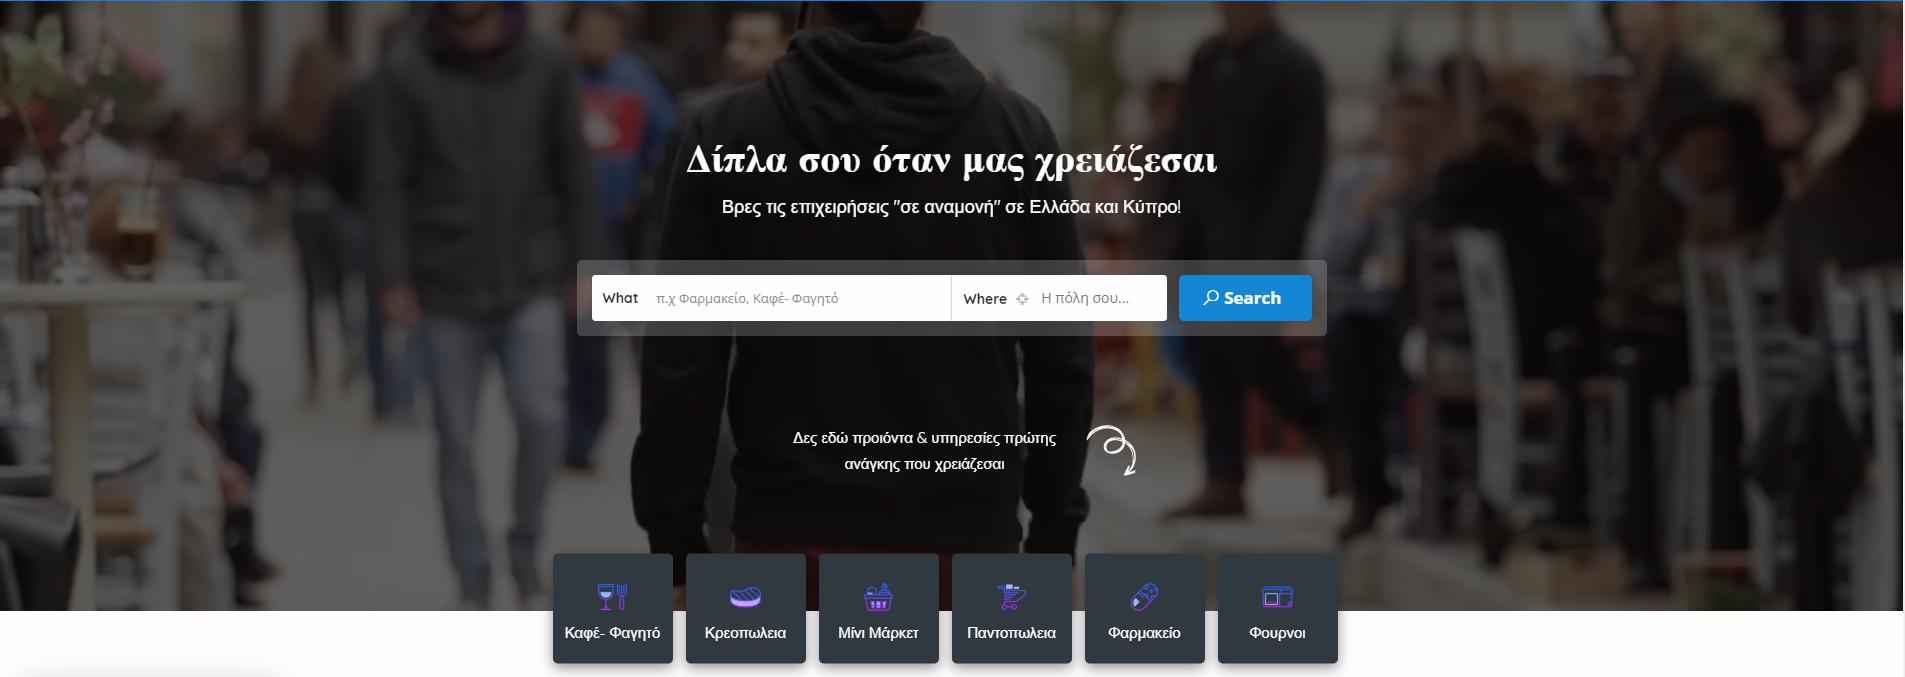 onhold.gr βρες τις επιχειρήσεις σε αναμονή σε Ελλάδα και Κύπρο Seanamoni | YouBeHero